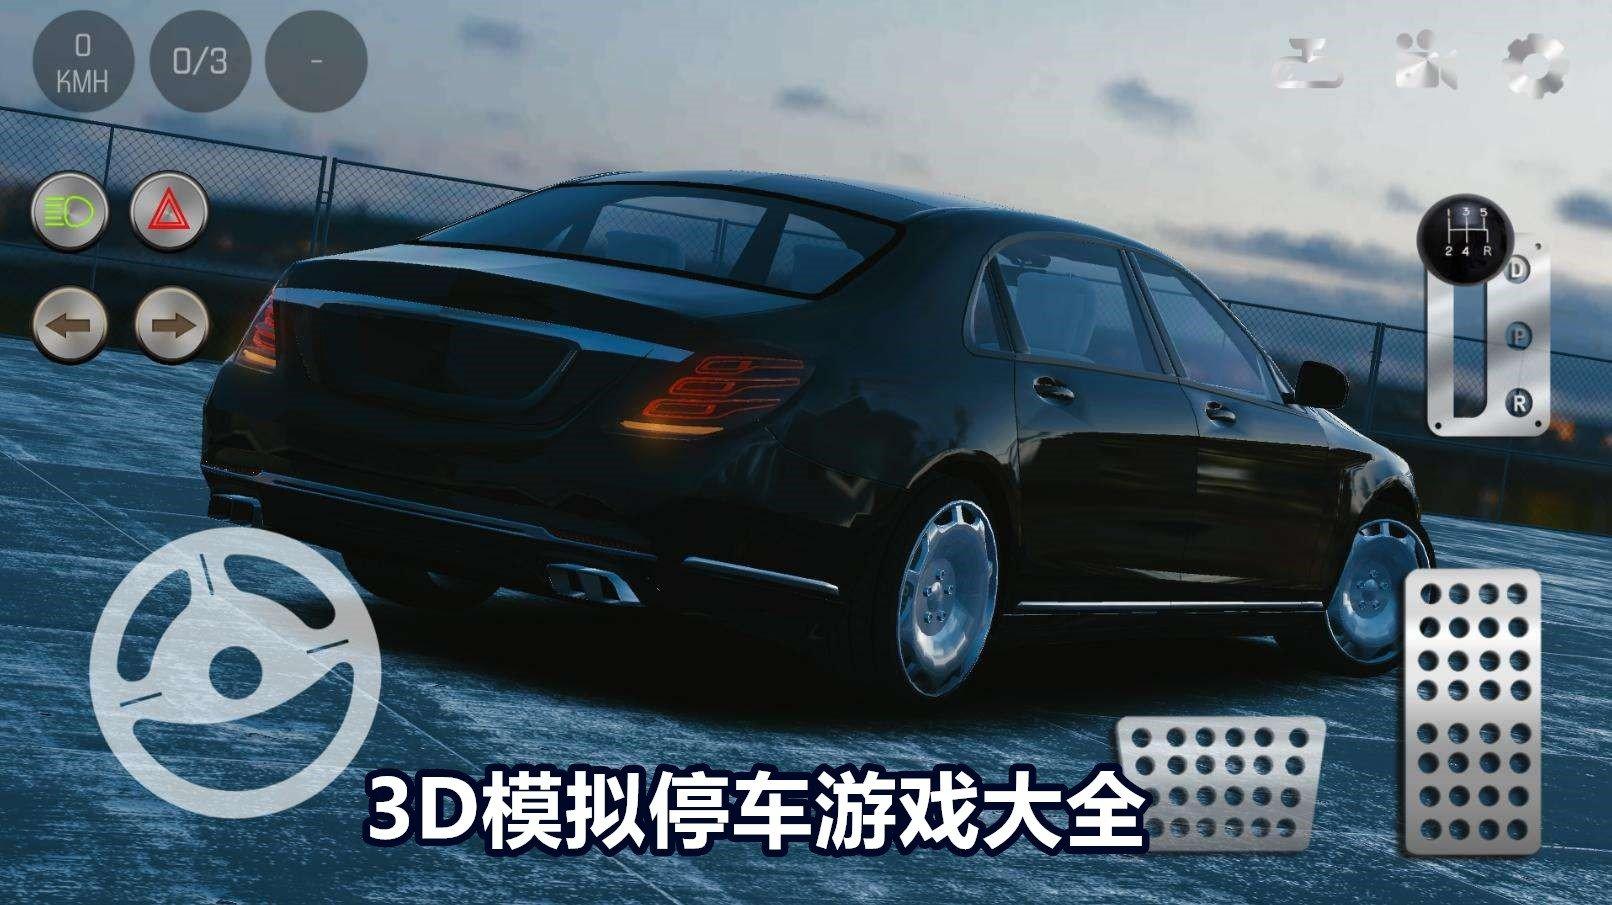 3D模拟停车游戏大全